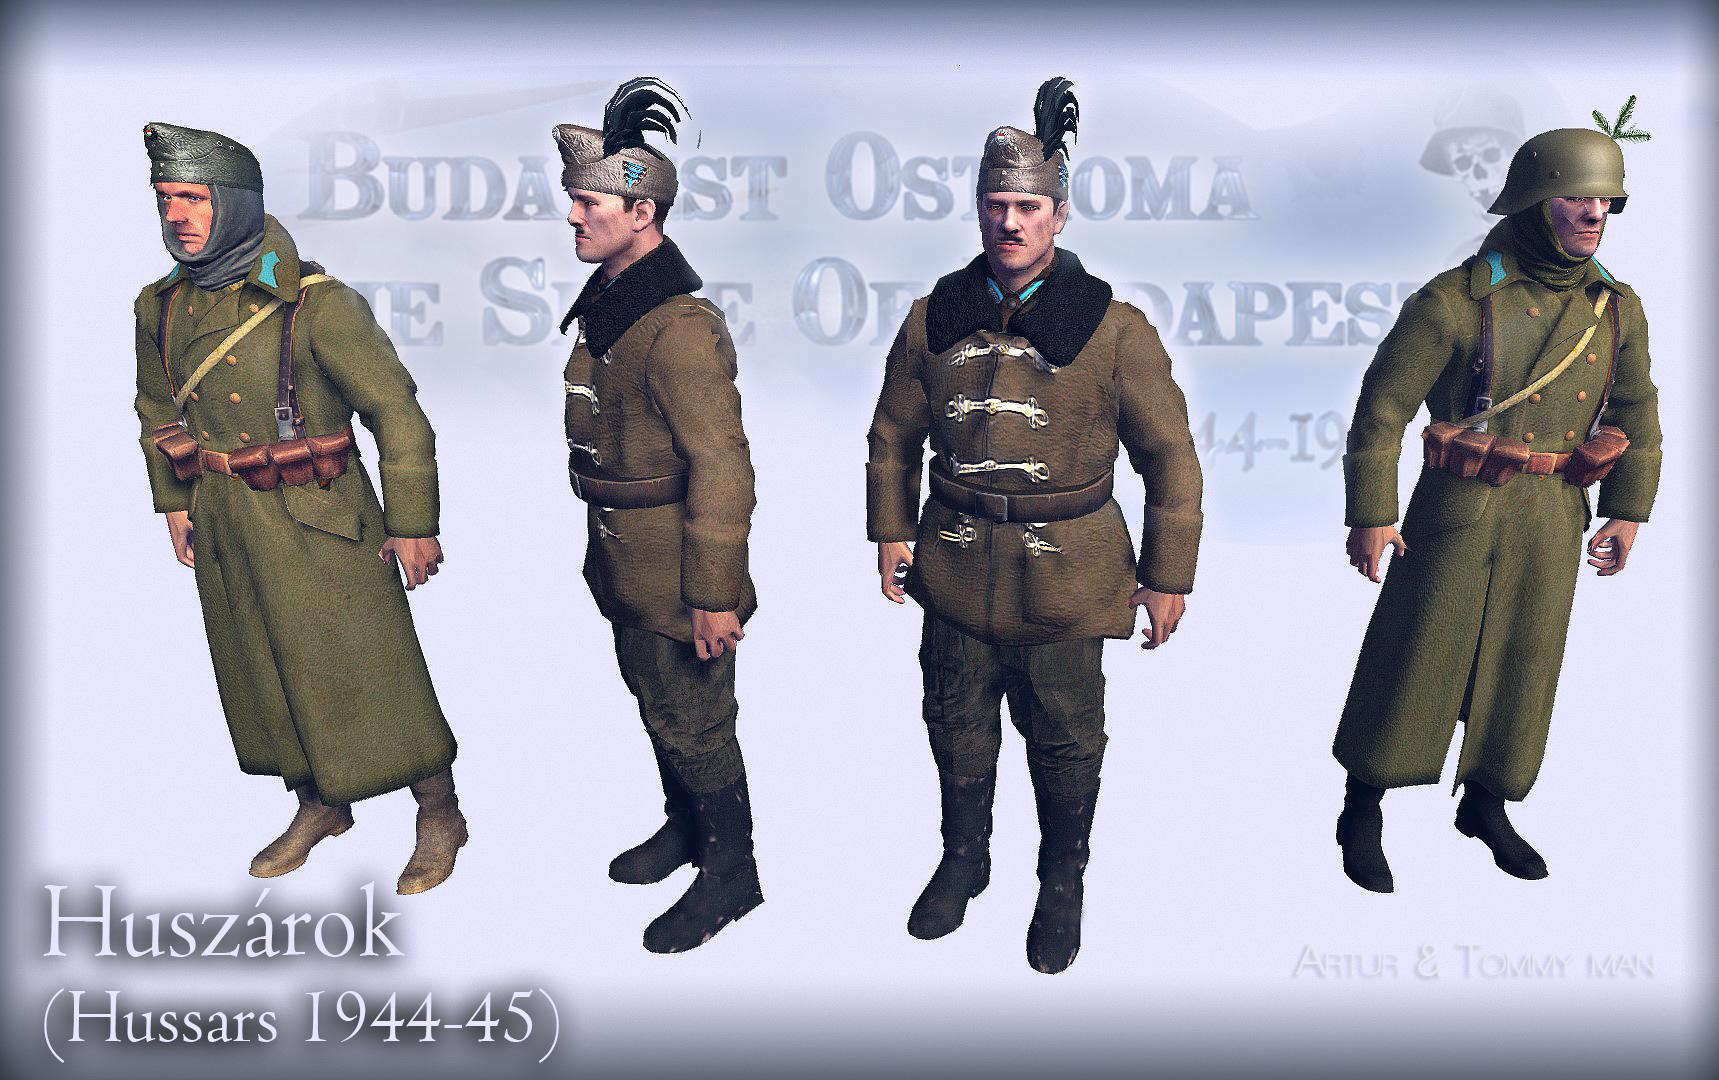 Huszárok Budapest ostromban,1944,45 Hungary men of war.